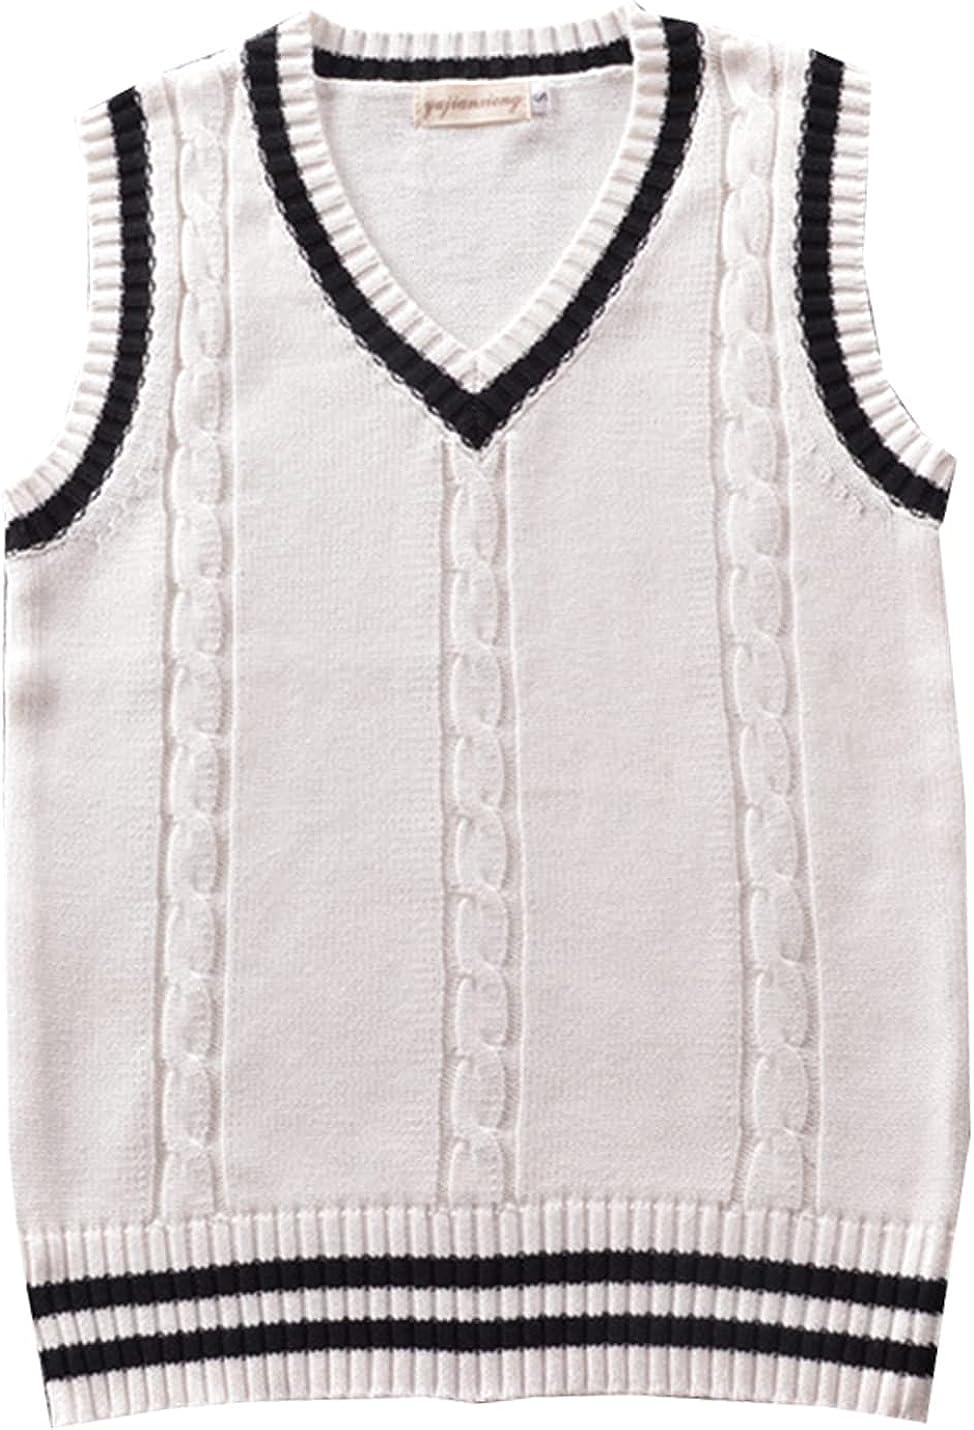 Kissonic Women's Sleeveless V Neck School Uniform Sweater Vest Cable Knit Pullover Gilet